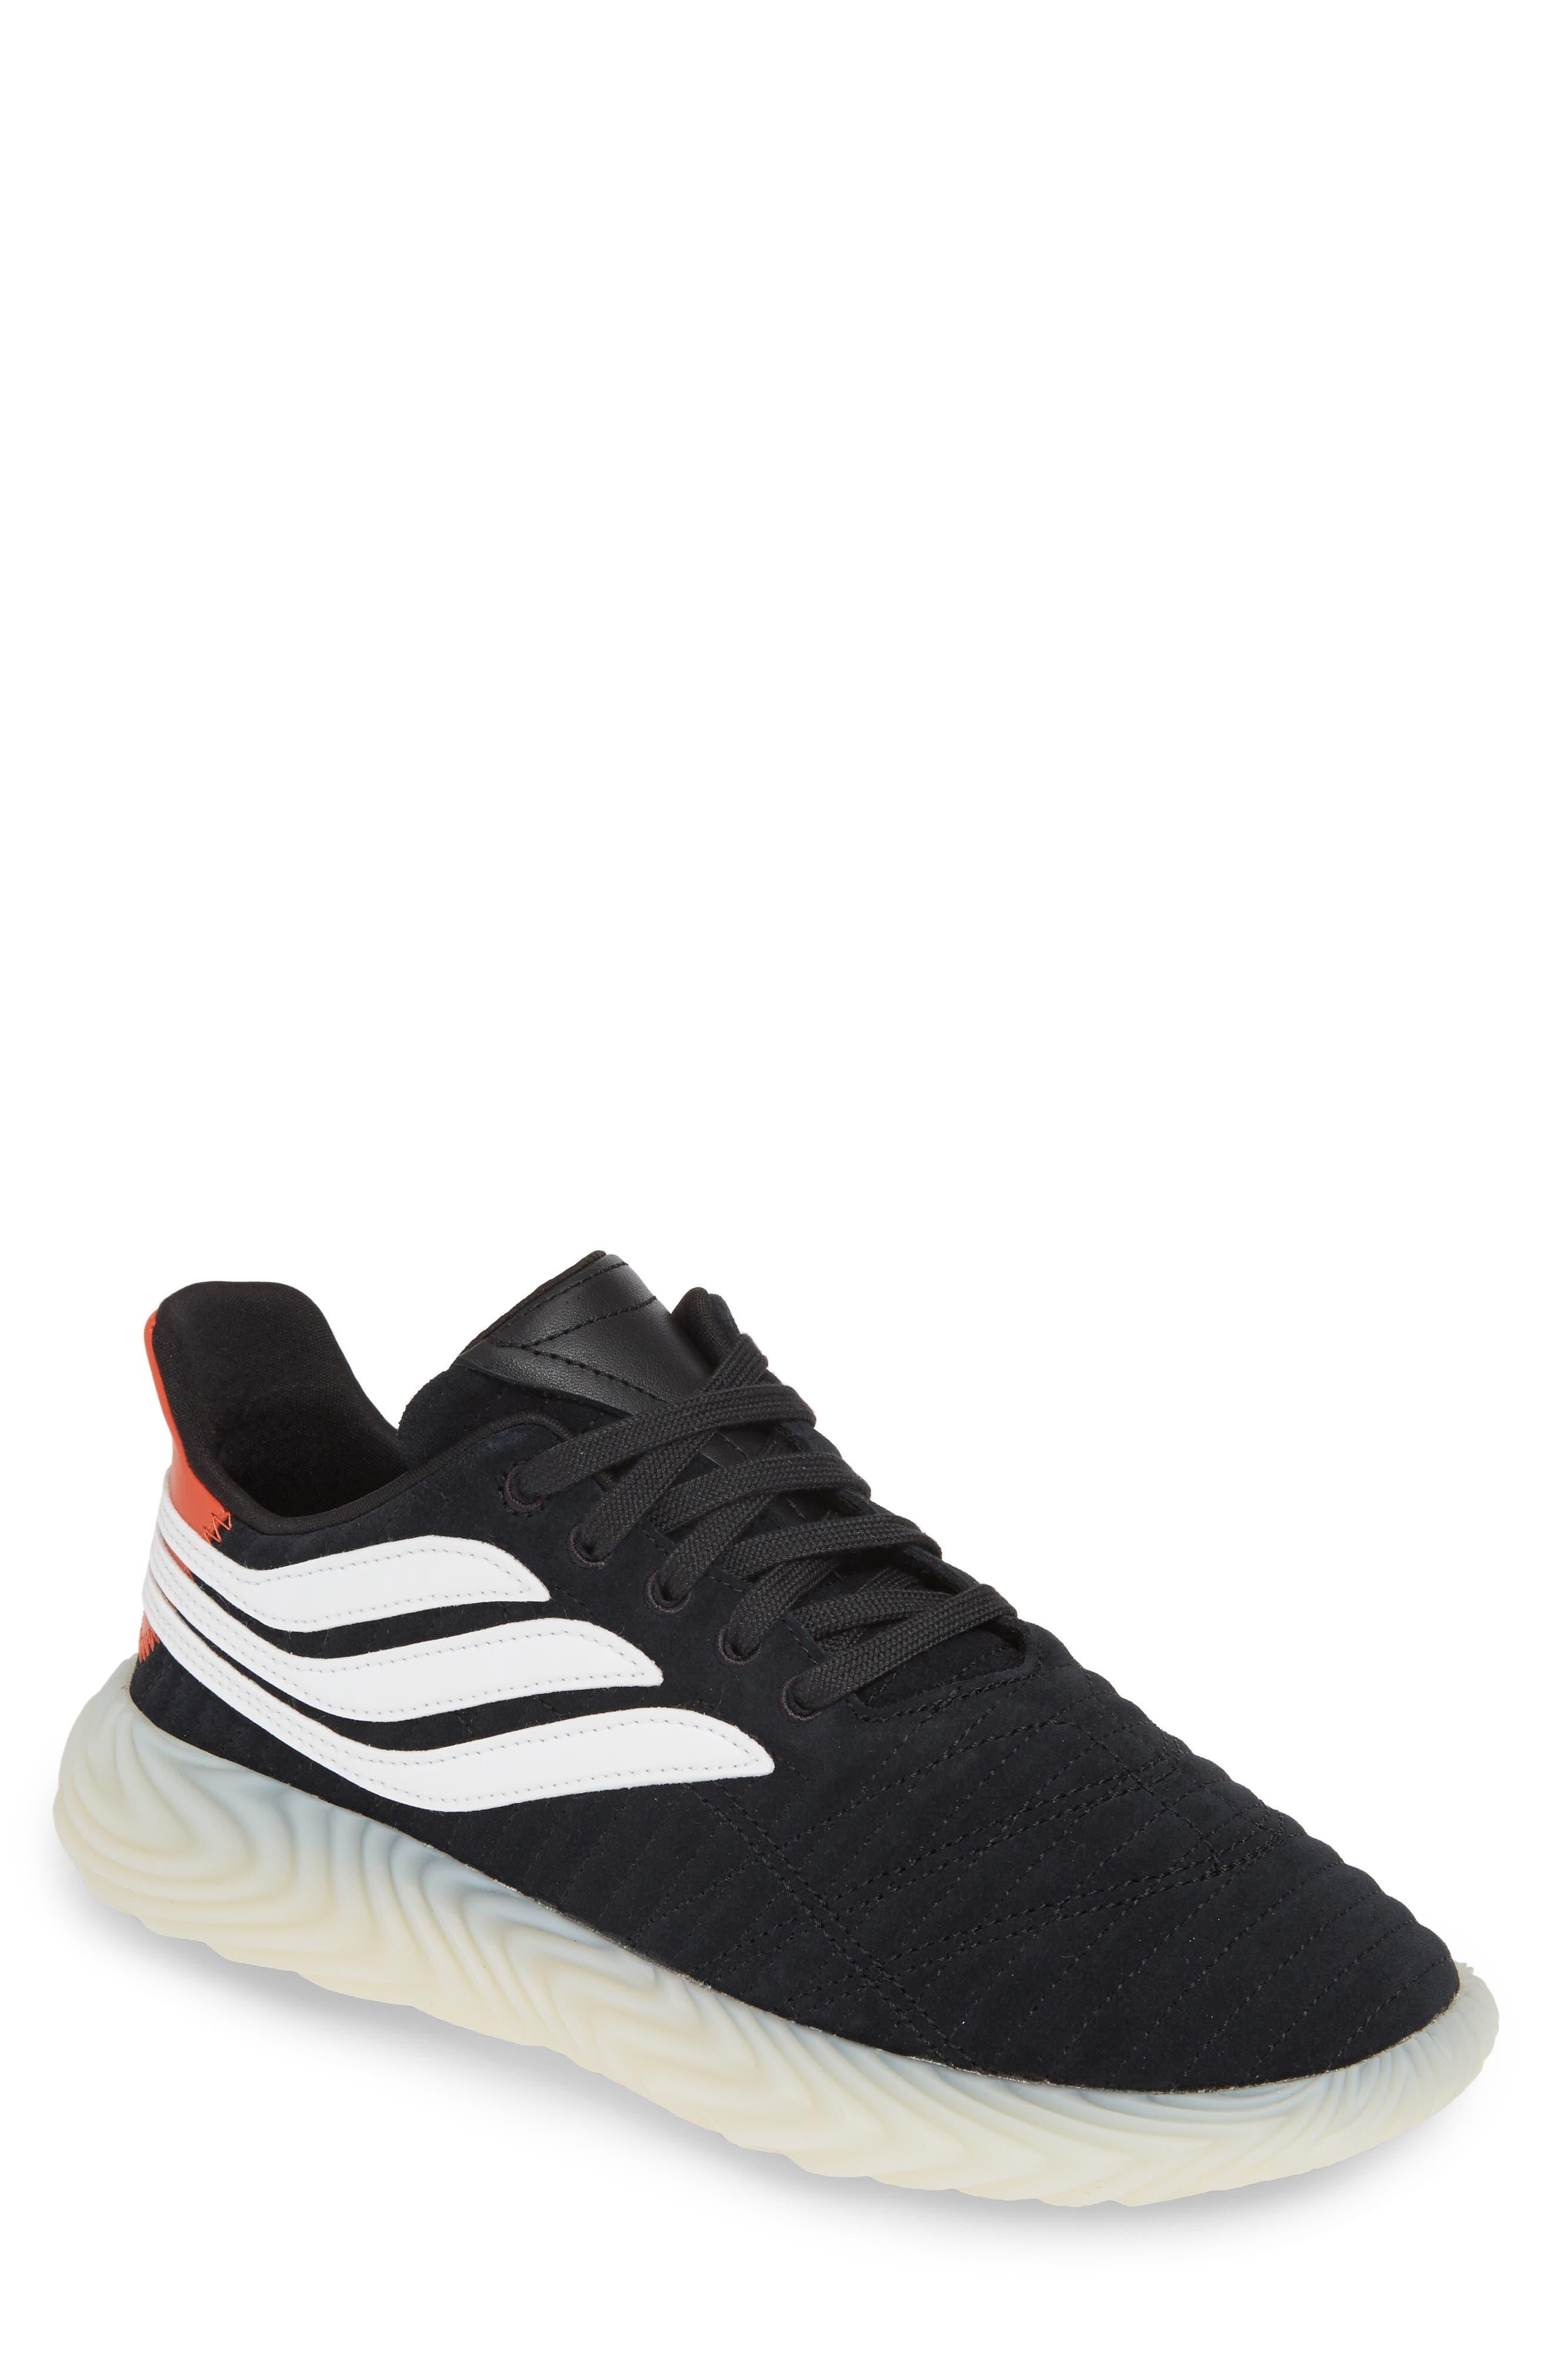 ,                             Sobakov Sneaker,                             Main thumbnail 1, color,                             CORE BLACK/ OFF WHITE/ AMBER